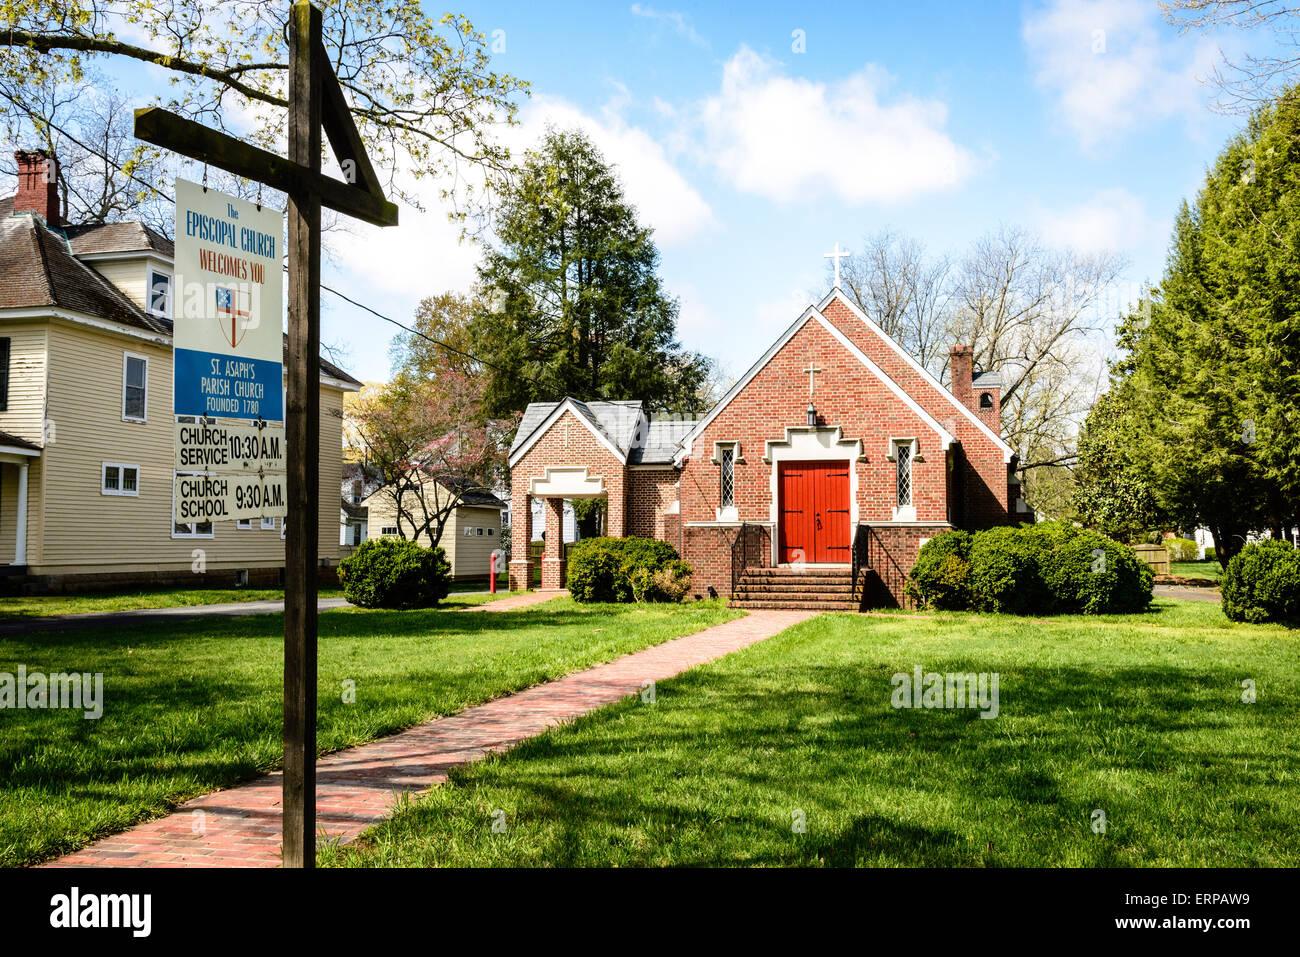 St Asaphs Episcopal Church 130 South Main Street Bowling Green